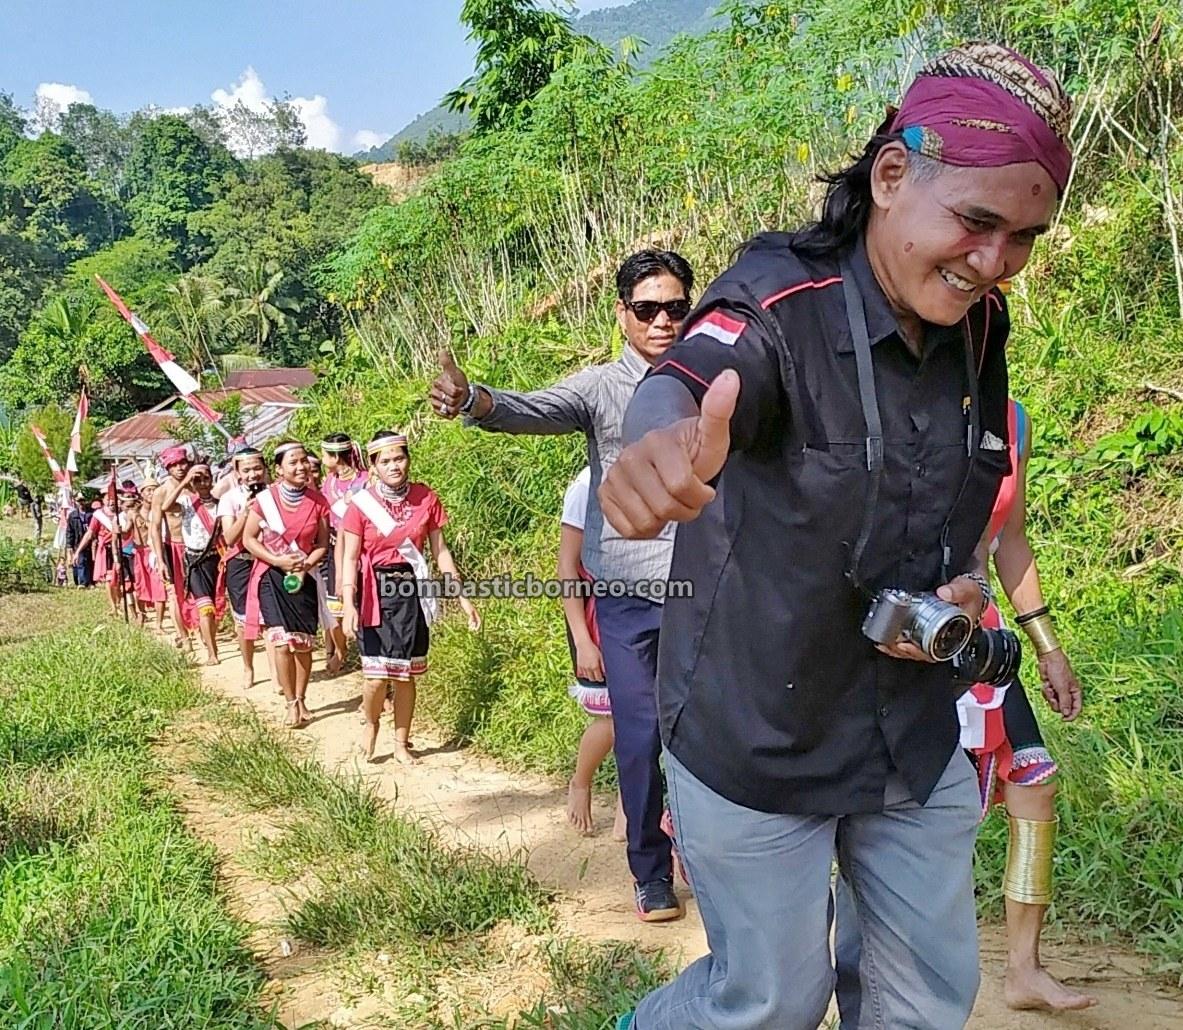 Dusun Medeng, authentic, traditional, backpackers, Kalimantan Barat, Siding, Dayak Bidayuh, Ethnic, native, village, Tourism, travel guide, Borneo, 印尼西加里曼丹, 原住民丰收节日,